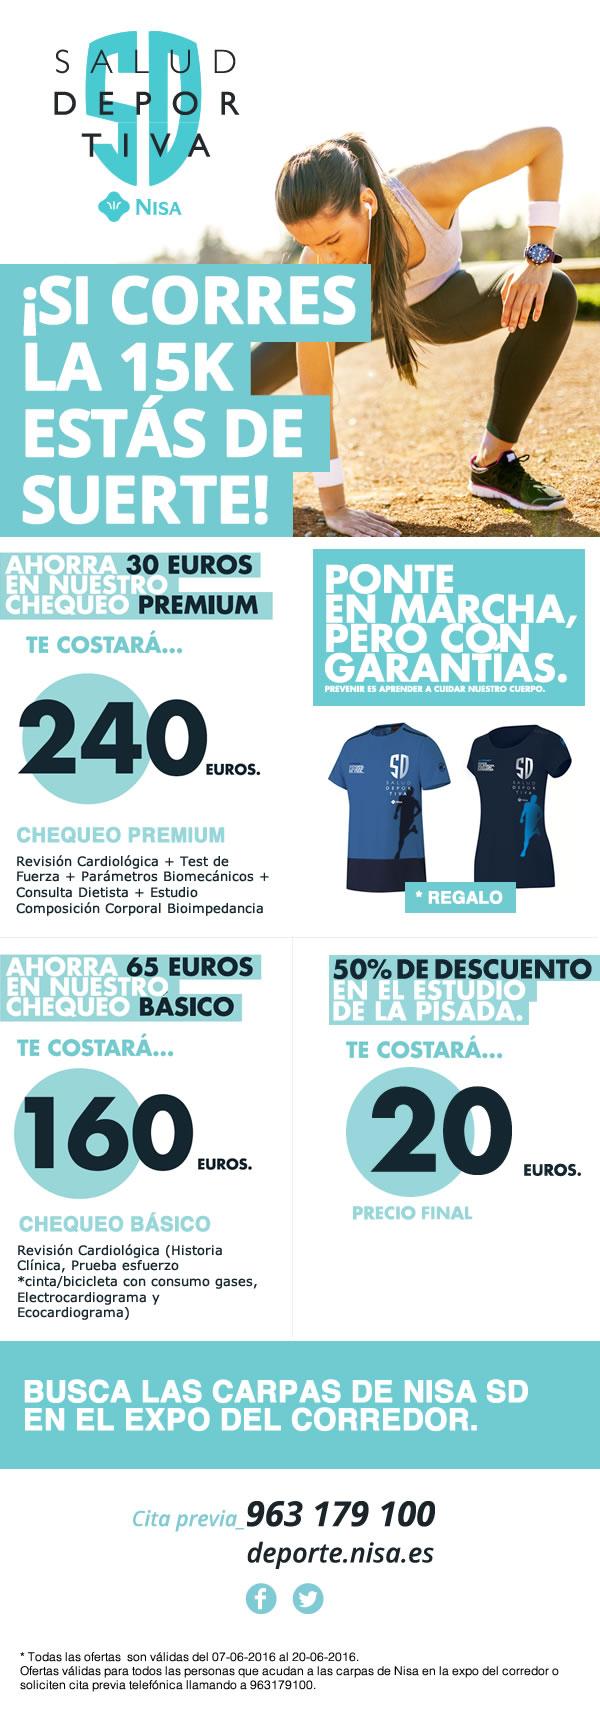 Newsletter para carrera 15 de Valencia